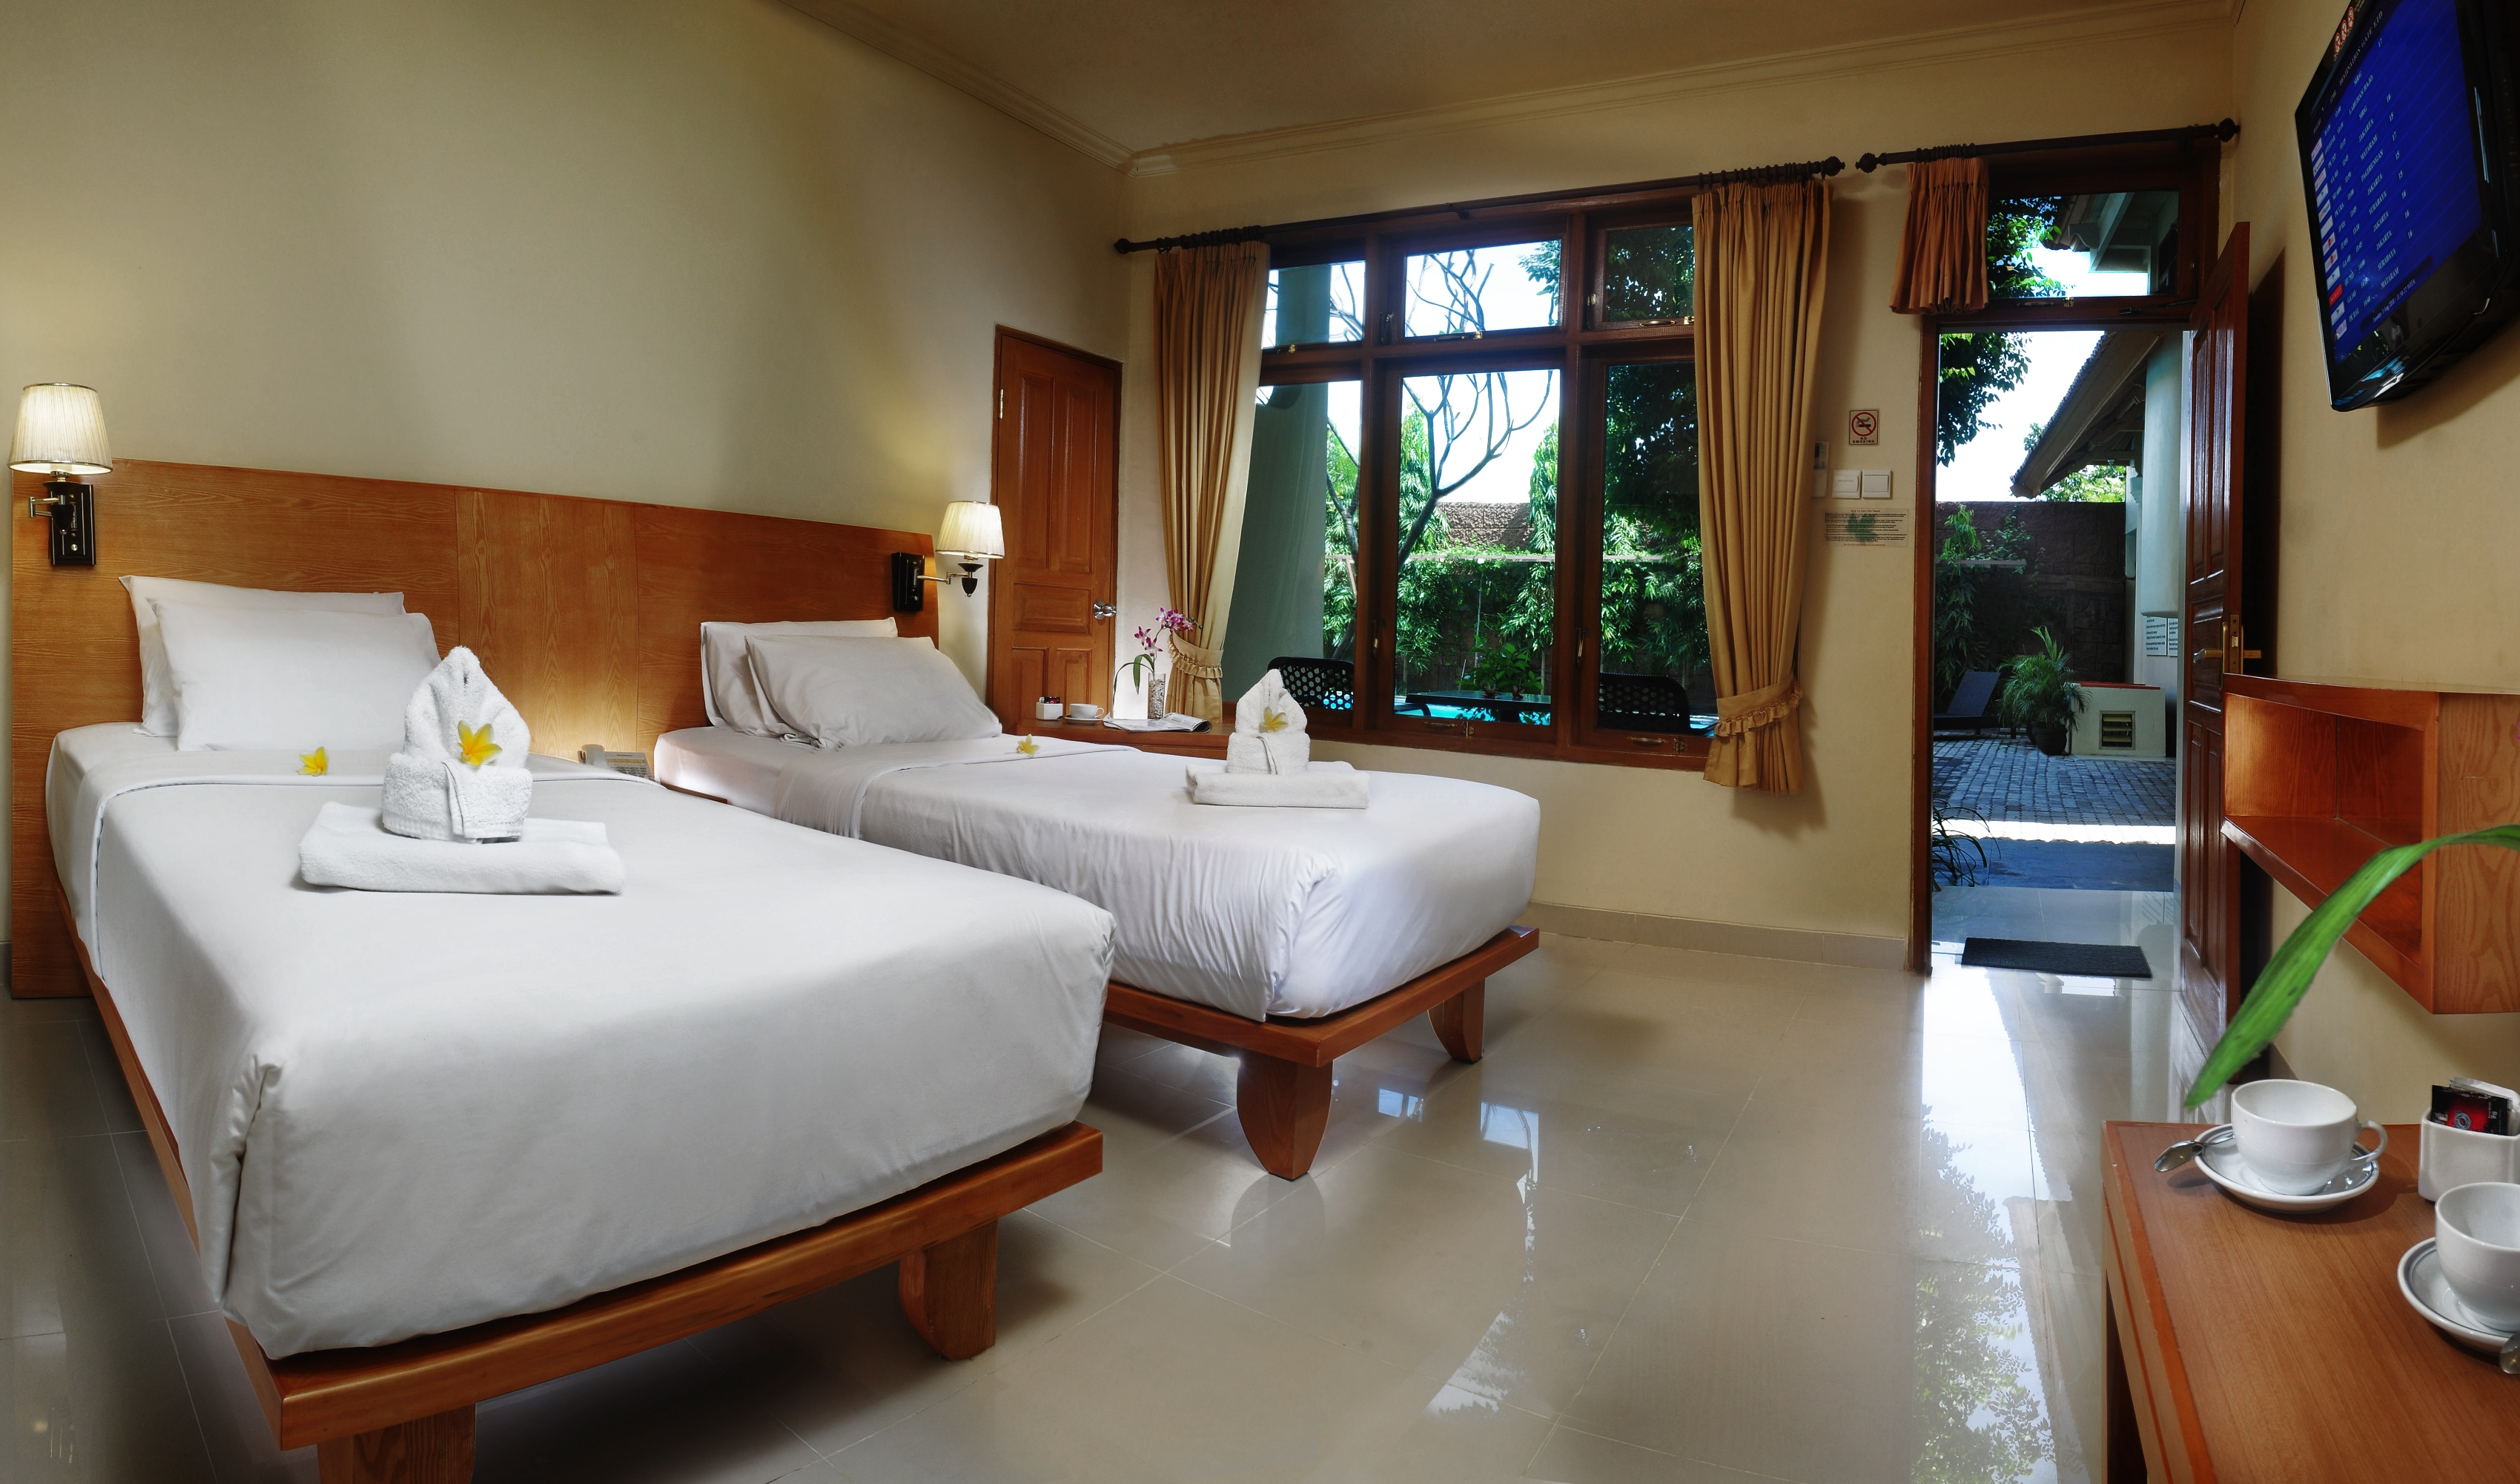 Rooms Gallery Febri S Hotel Amp Spa Bali Hotel Kuta